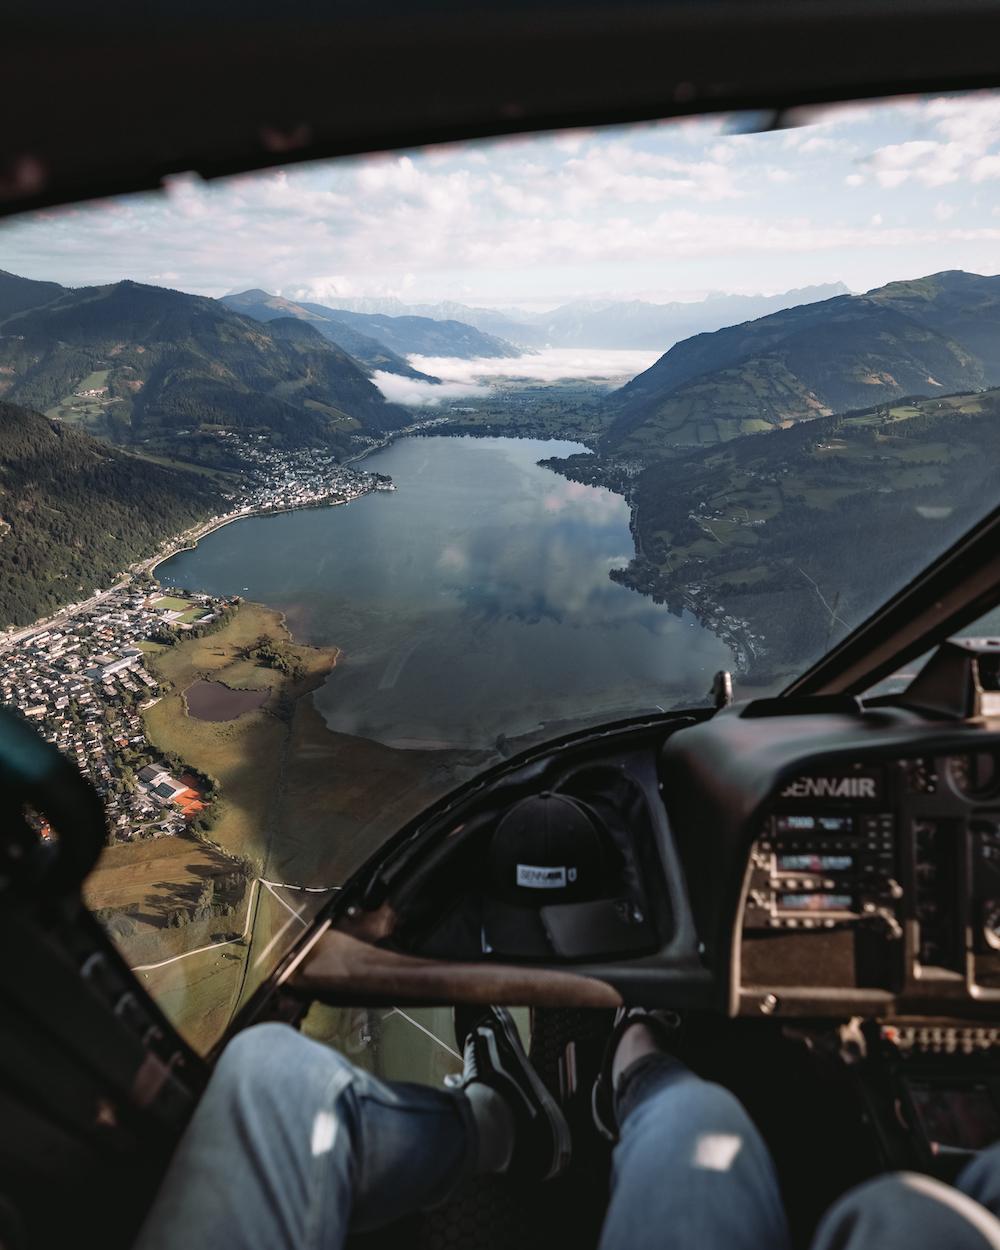 lake zell vanuit de helicopter